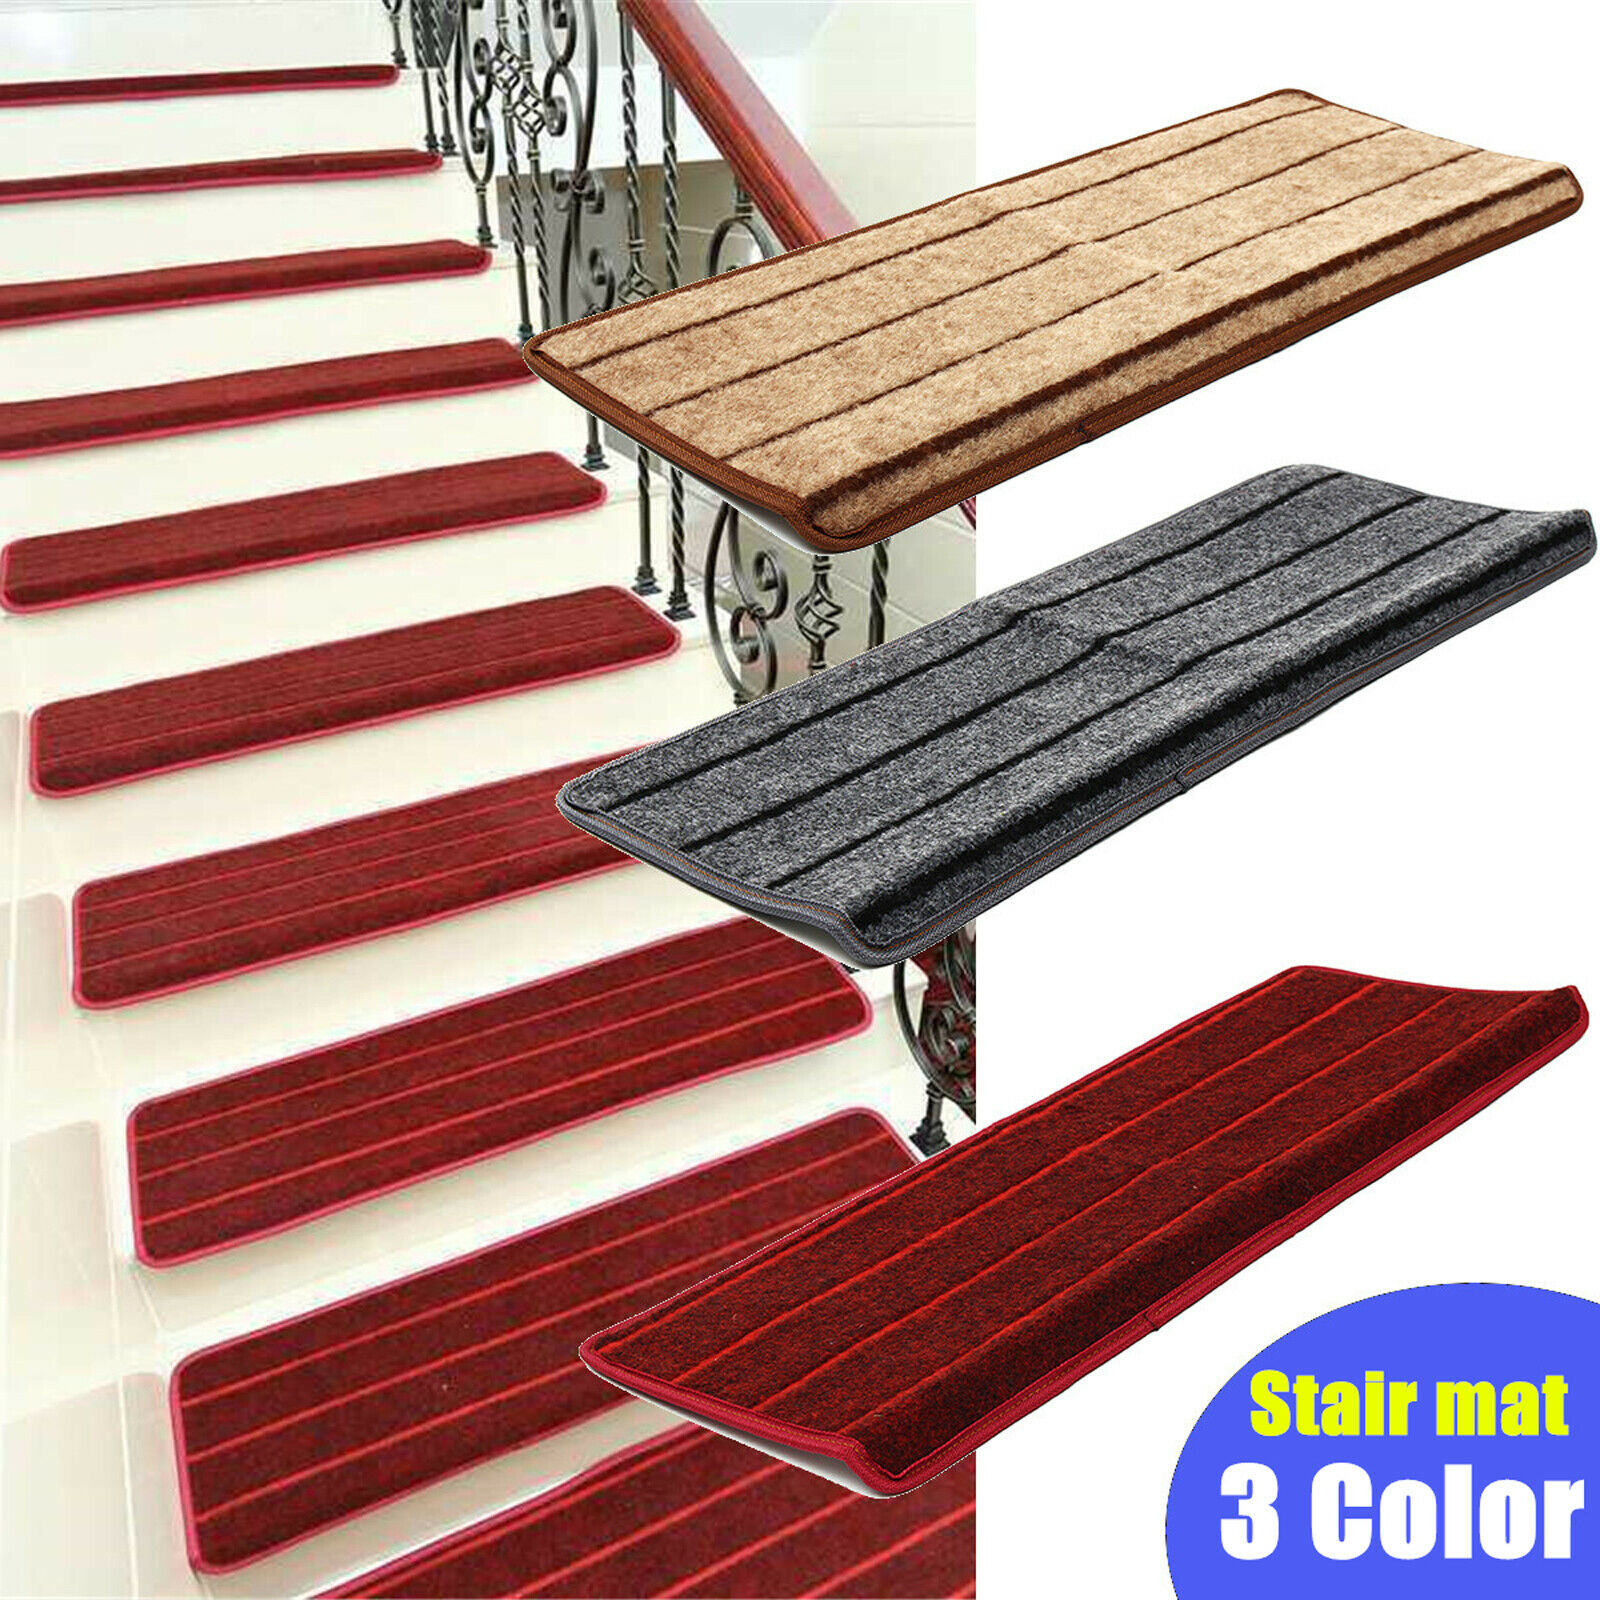 Non Slip Skid Self Adhesive Stair Tread Carpet Staircase Step Mat   Non Skid Carpet Stair Treads   Stair Runner   Bullnose Carpet   Flooring   Adhesive   Amazon